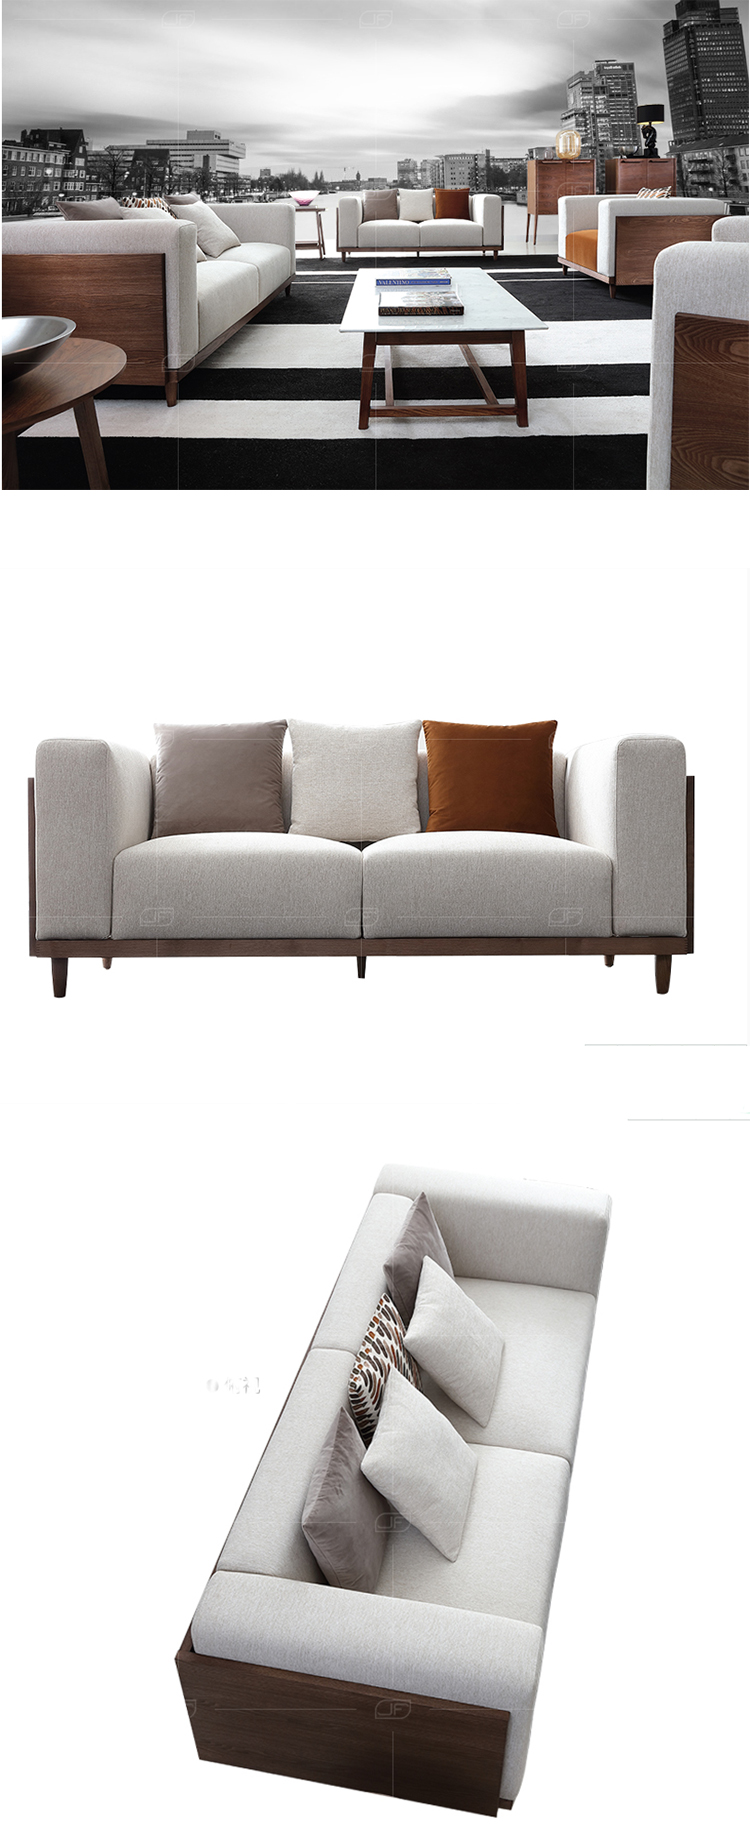 Elegant european stylish modern sectional couch living room sofa set furniture